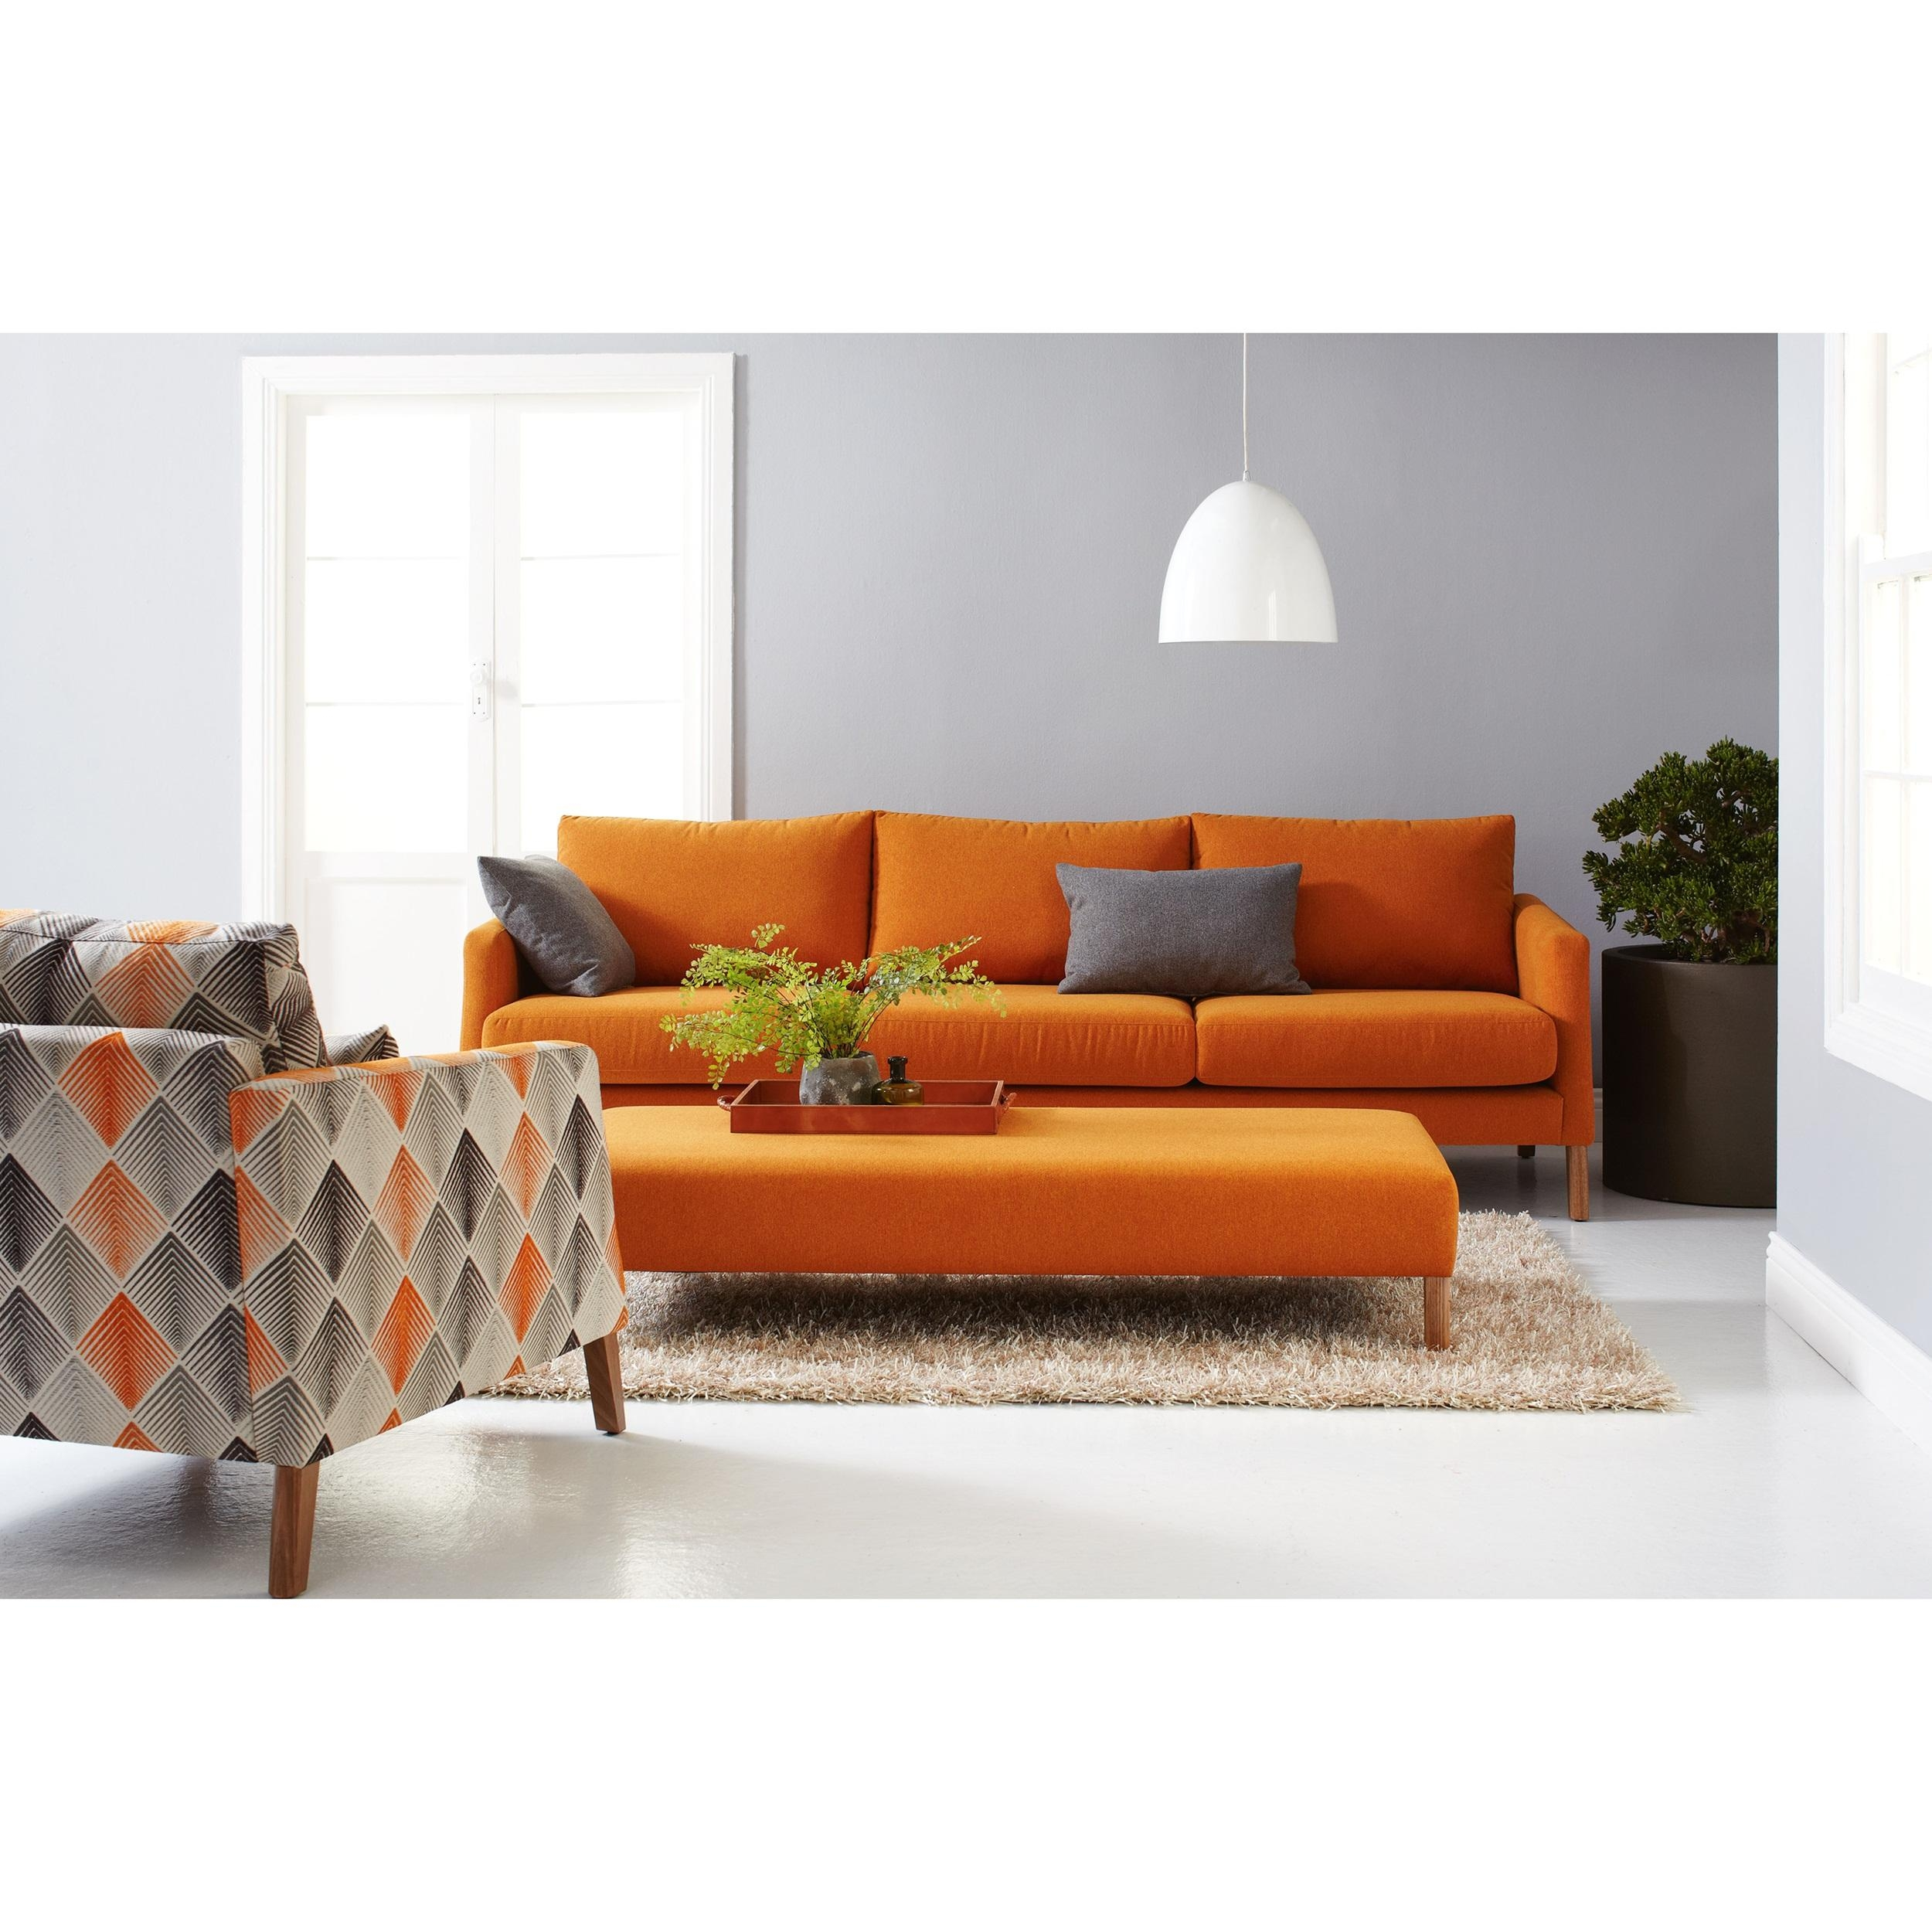 20 Best Orange Sofa Chairs  Sofa Ideas